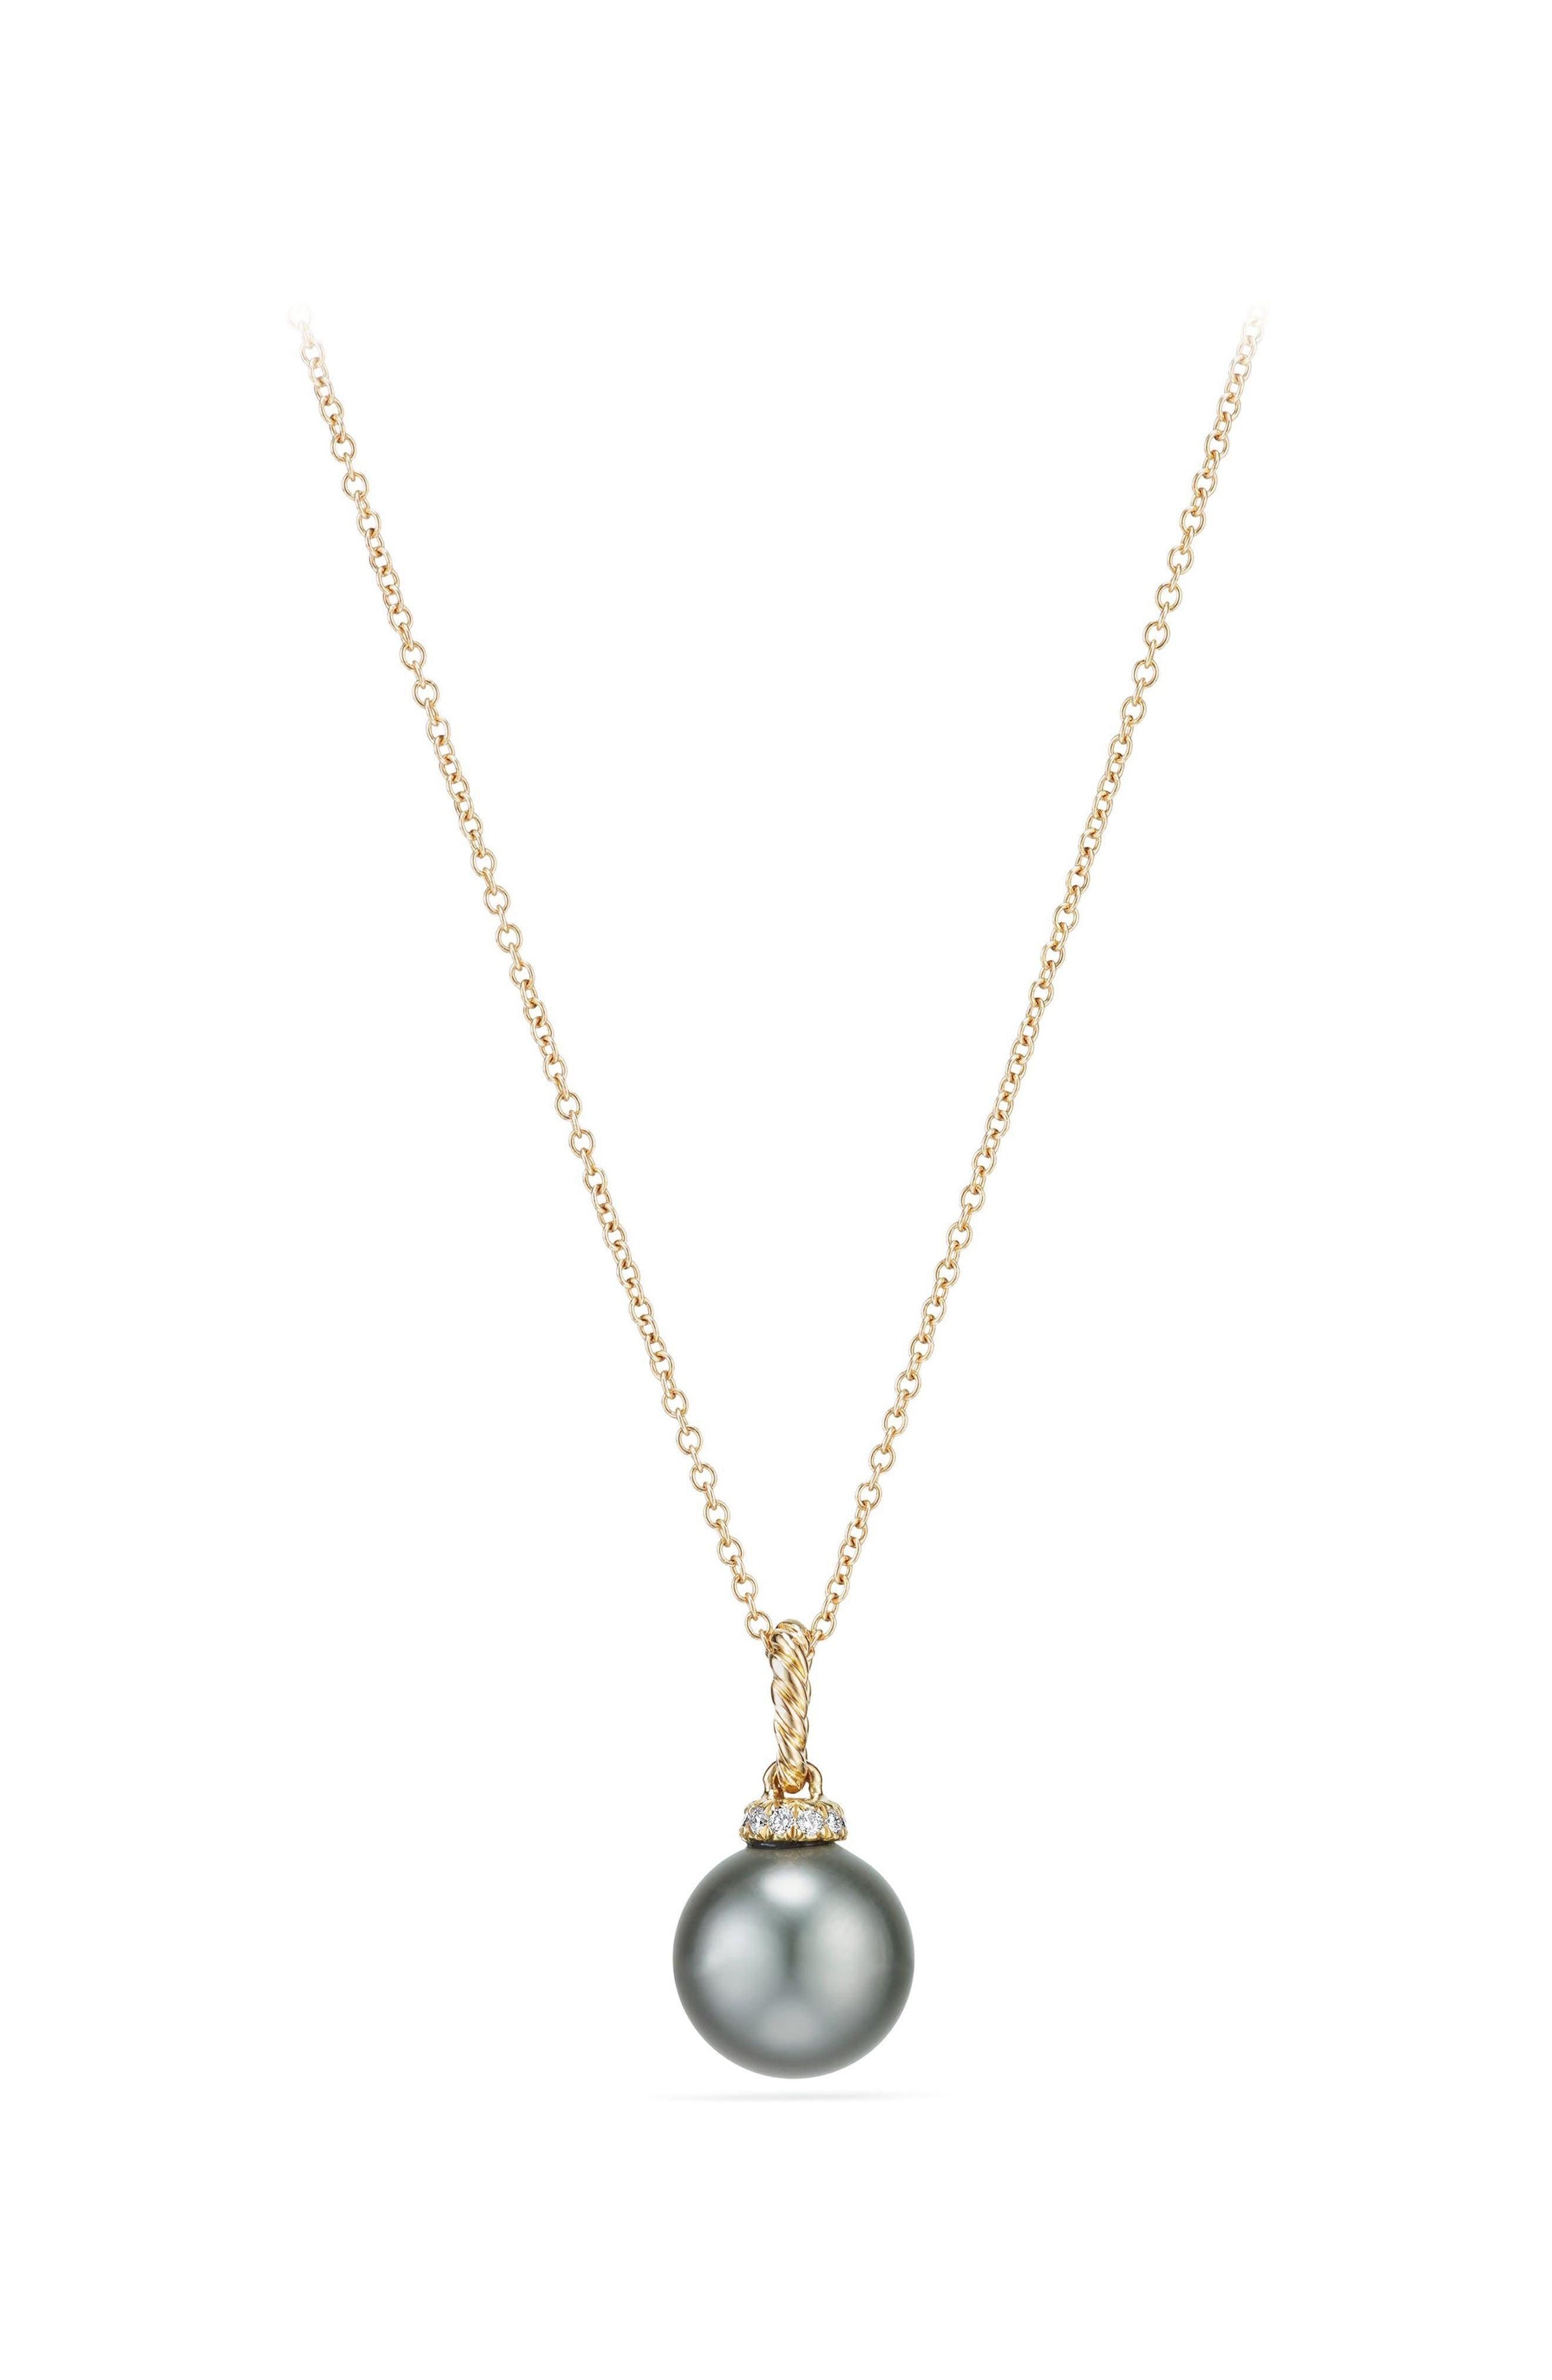 Solari Pendant Necklace with Diamonds,                         Main,                         color, GOLD/ DIAMOND/ GREY PEARL